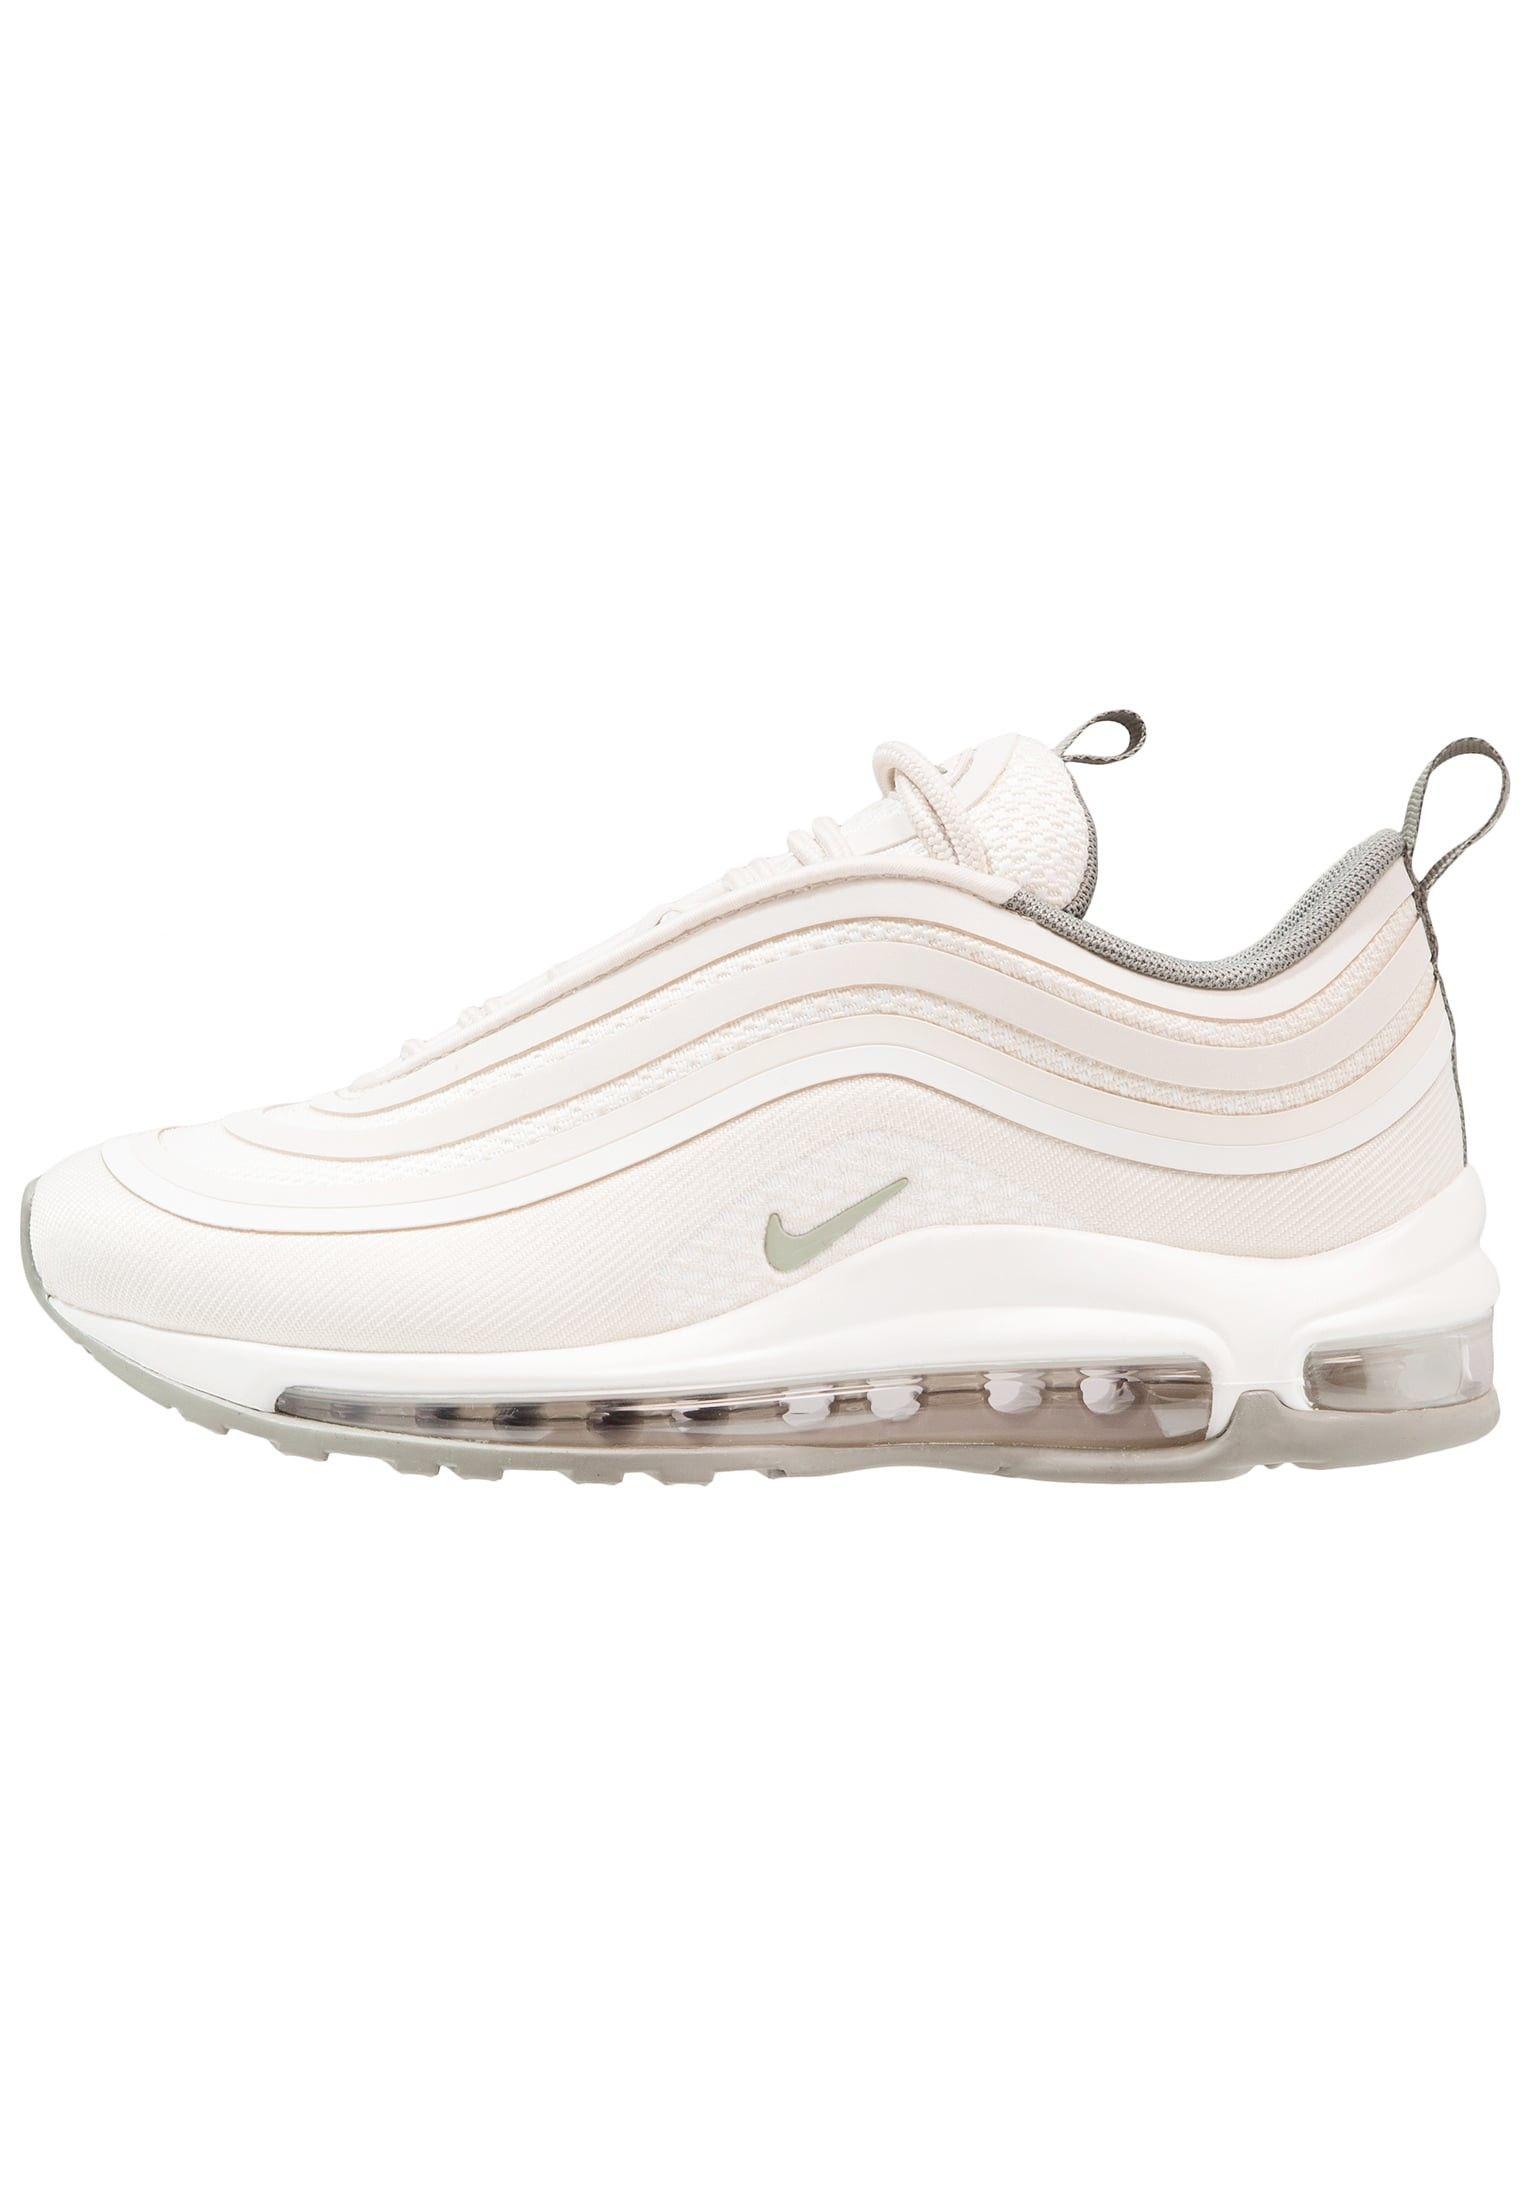 low priced 5799b 93e63 Damen Nike Footwear Für Sport W AIR MAX 97 UL 17 - Schuhe Low - Hell  Orewood BraunDunkel StuccoSummit Weiß